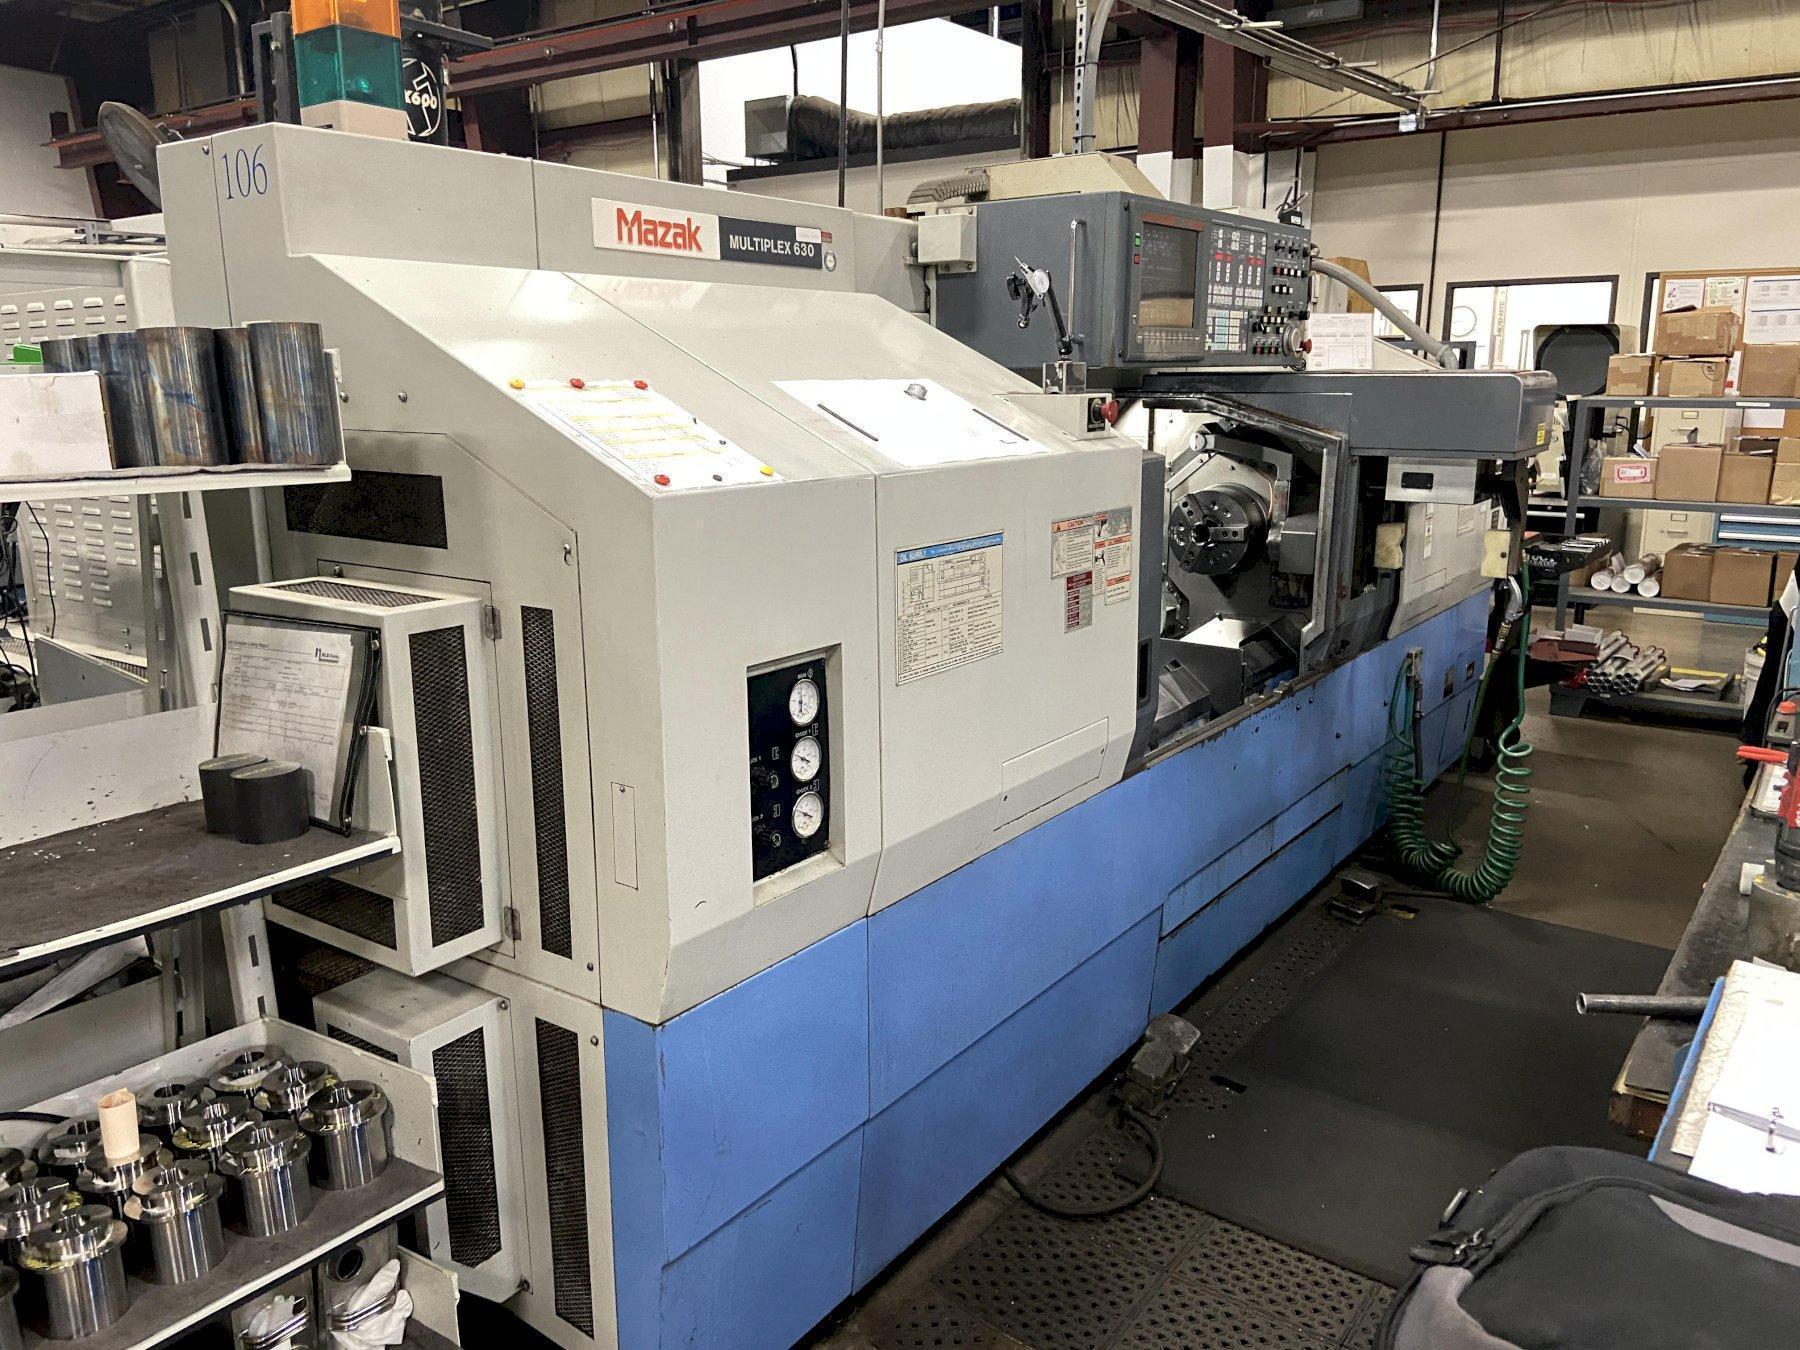 Mazak Multiplex 630 CNC Lathe